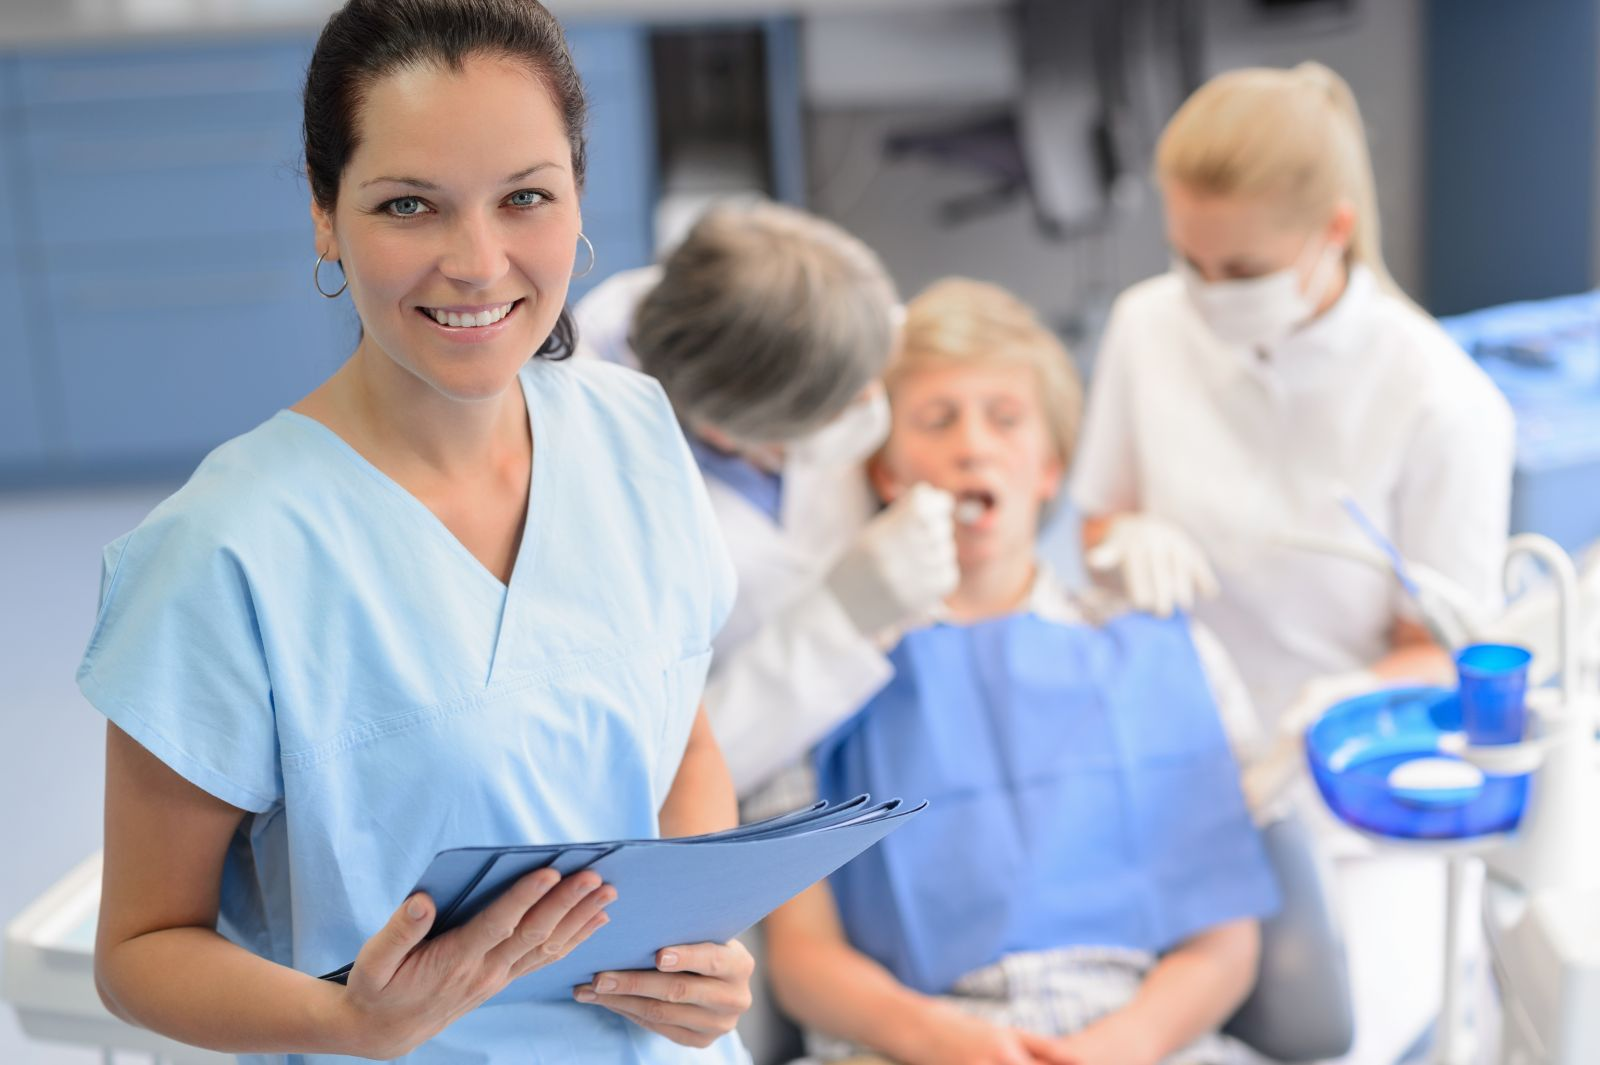 a dental resume that will catch their eye